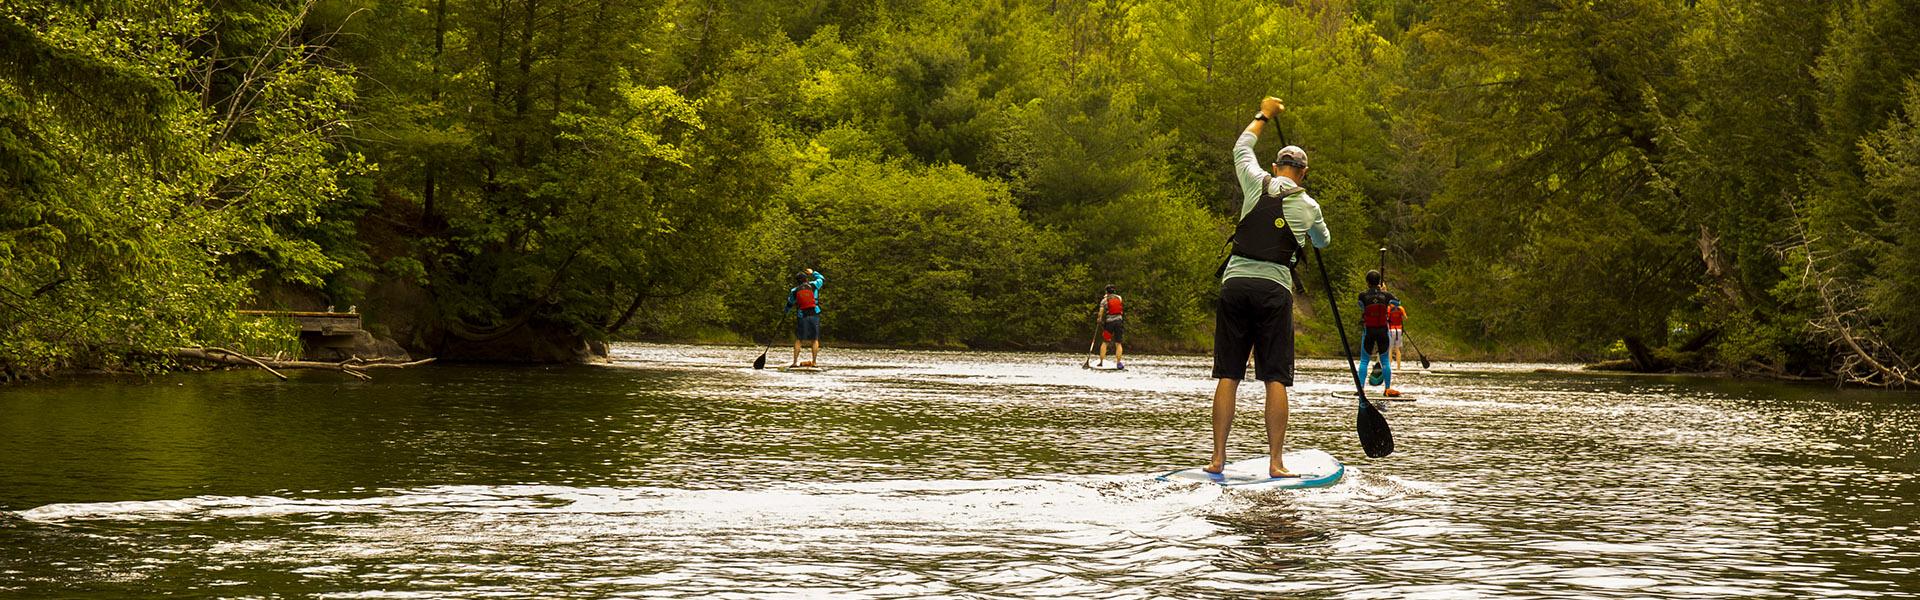 Muskoka Paddleboarding Adventure